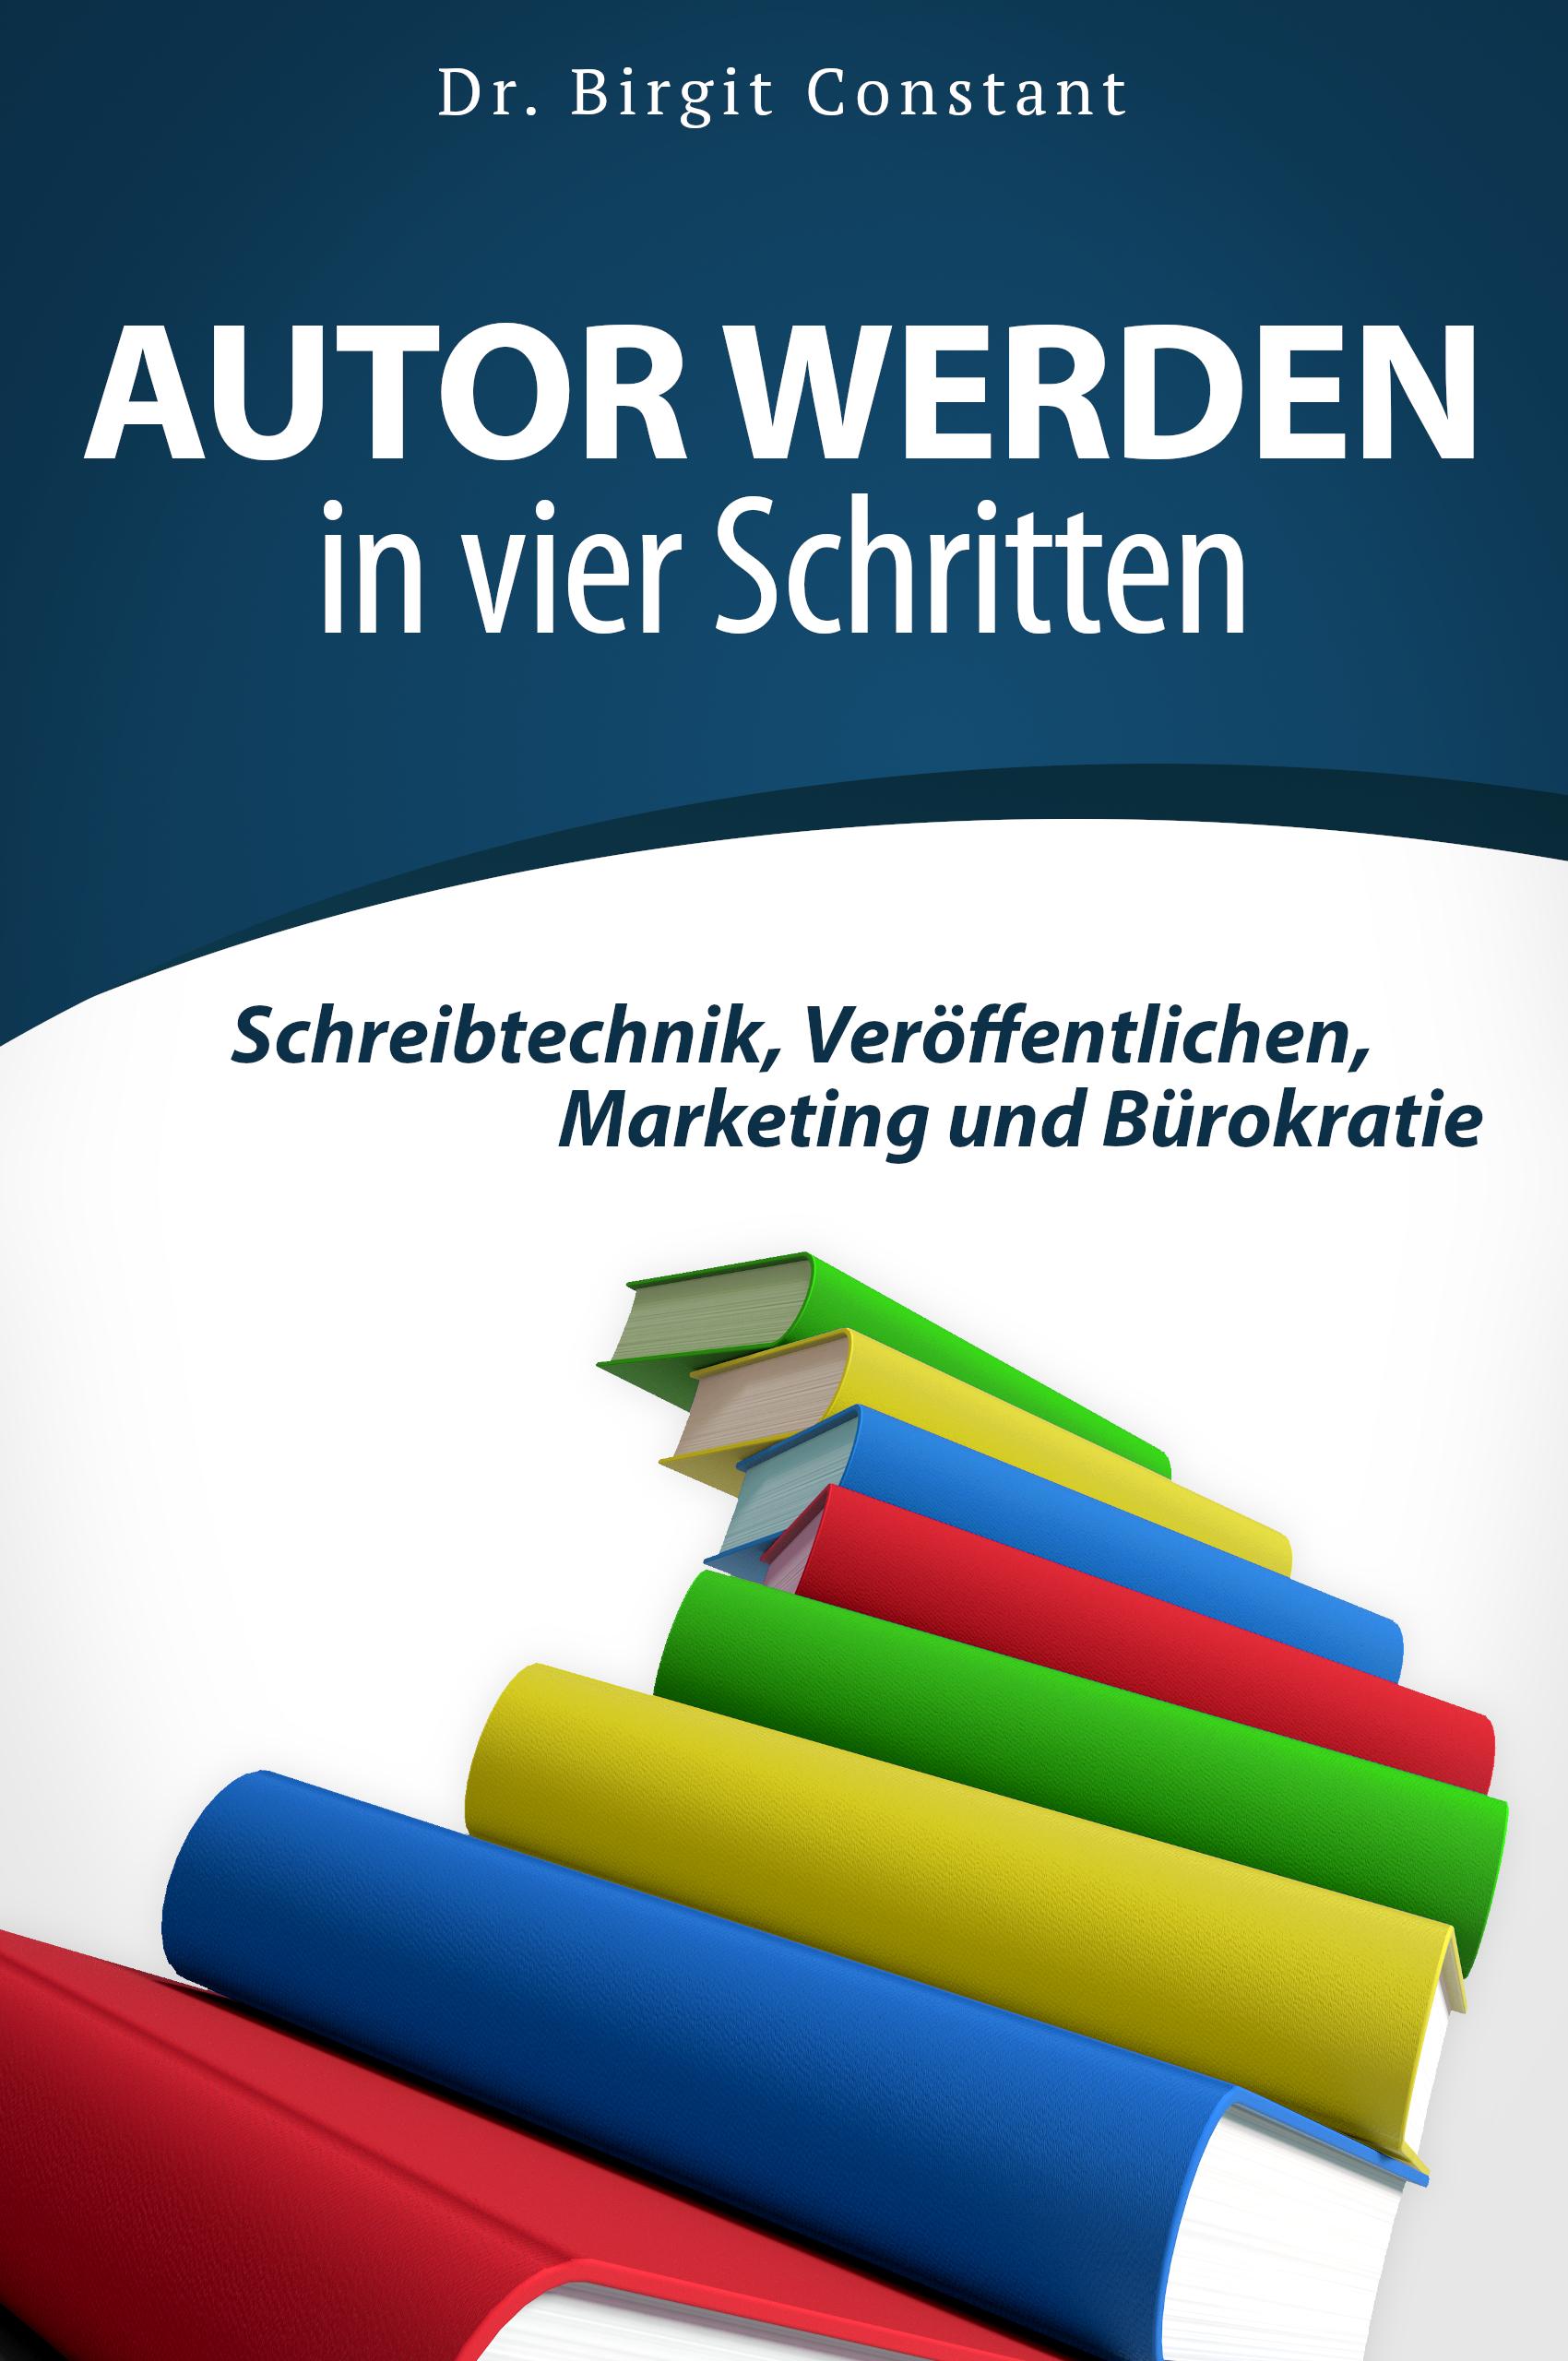 Autor werden in vier Schritten Birgit Constant Book Cover